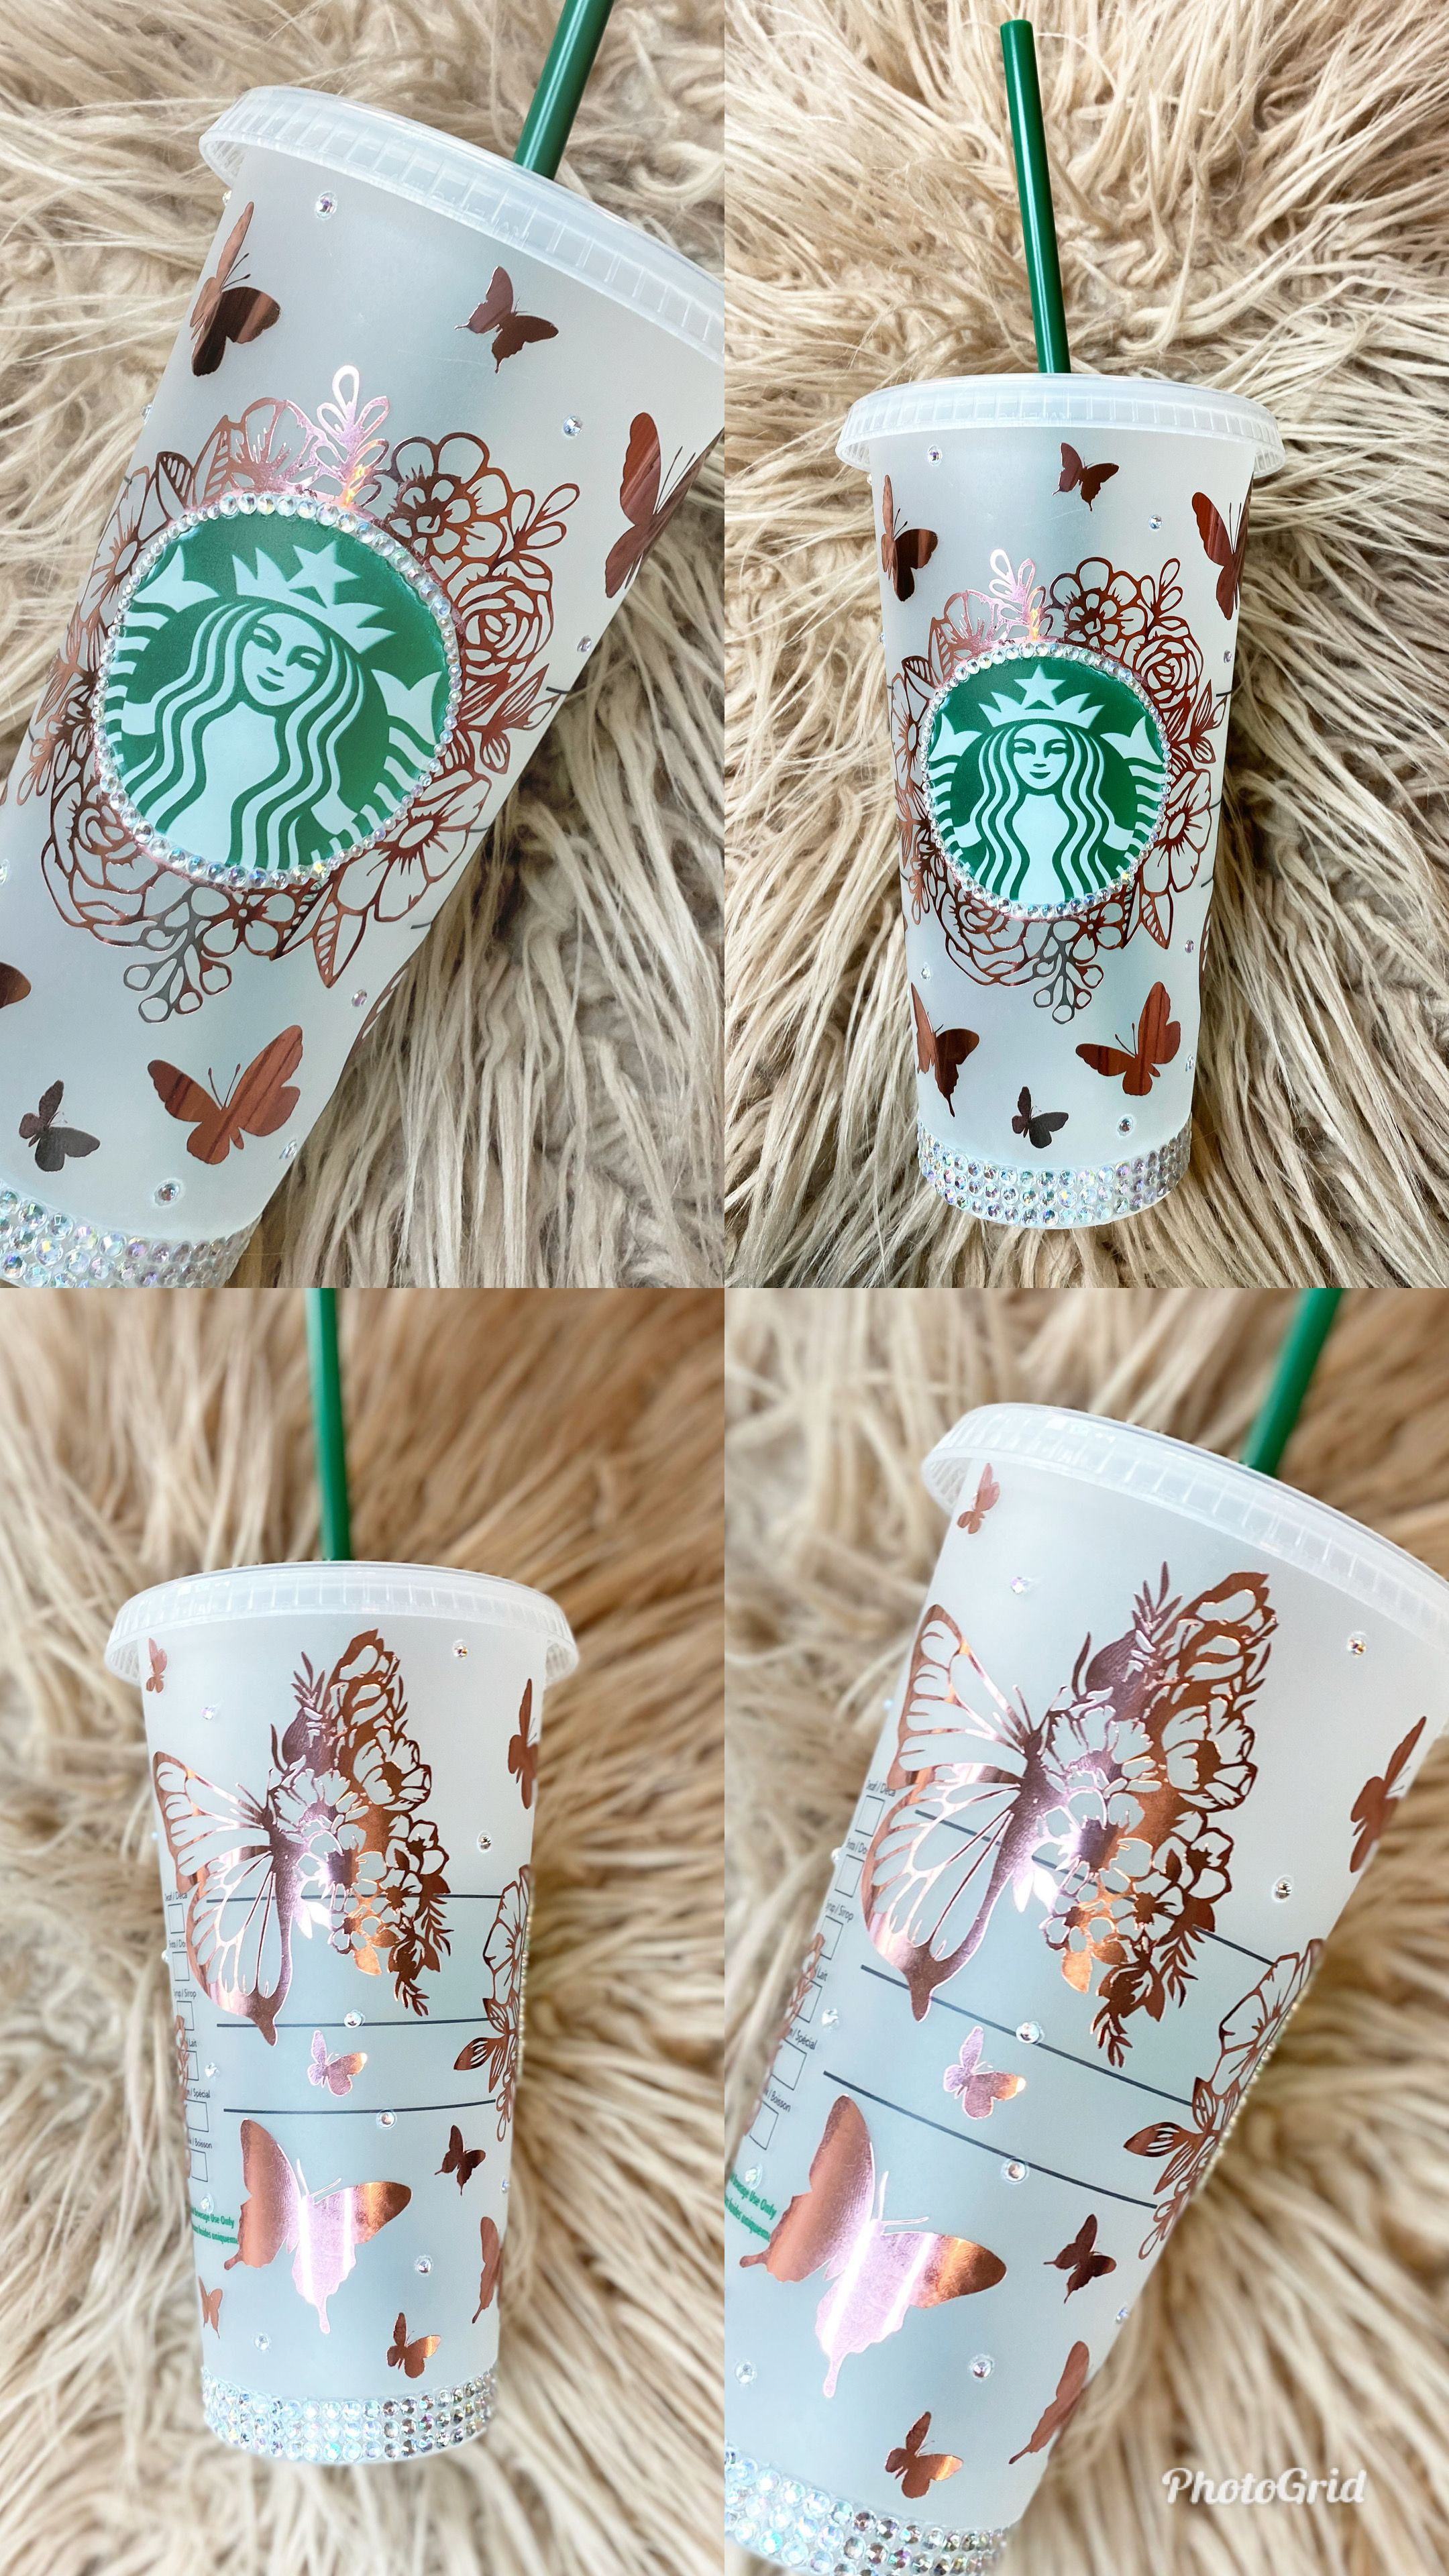 Personalized Rose Gold Starbucks tumbler